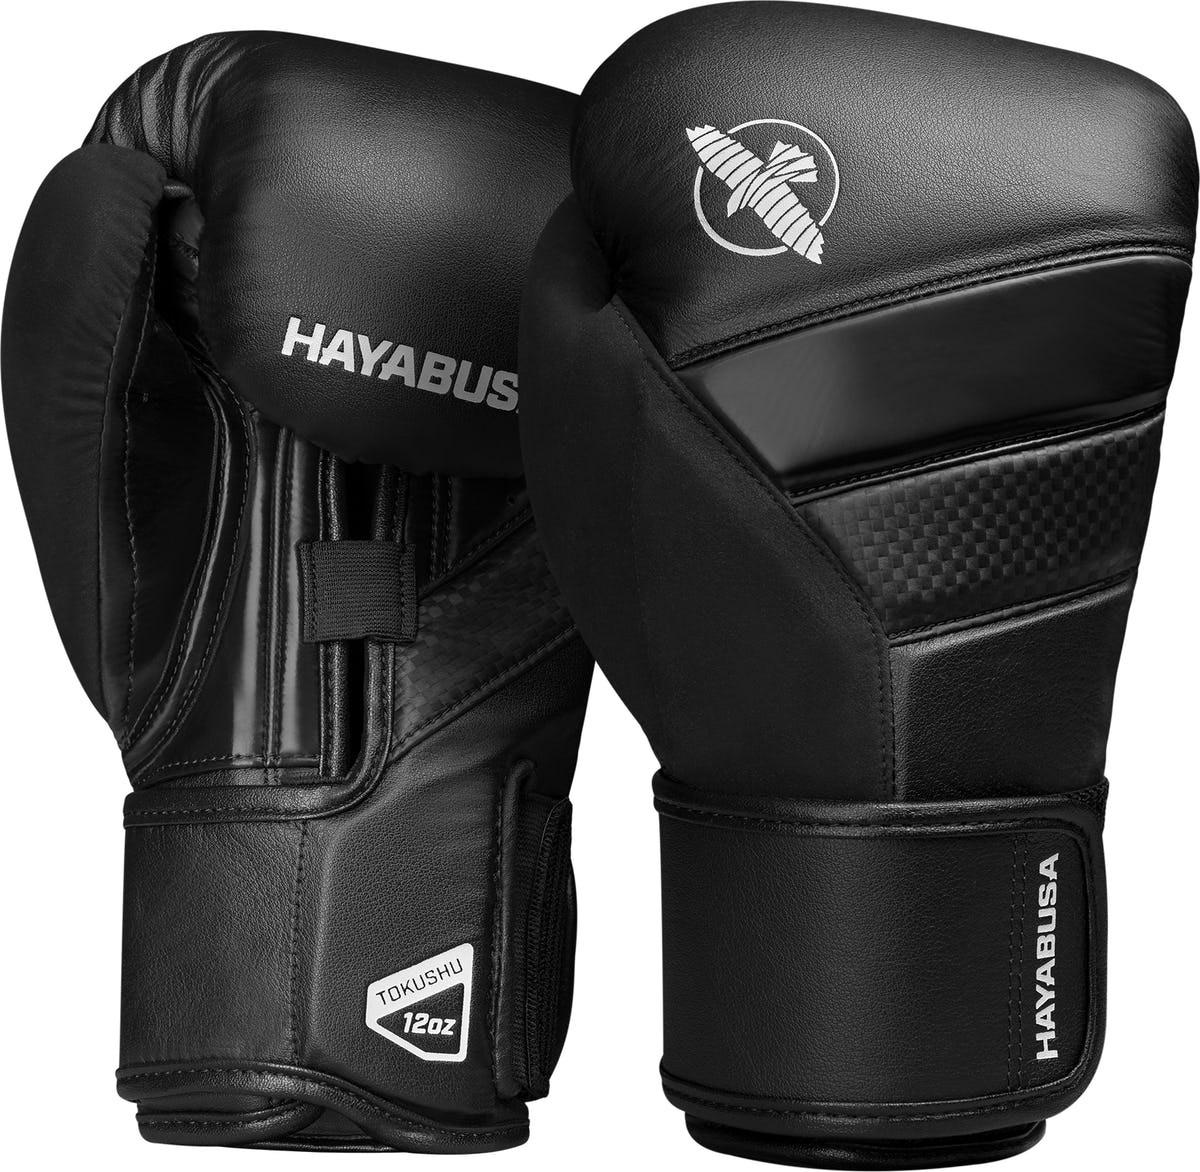 Hayabusa T3 Boxing Gloves Black